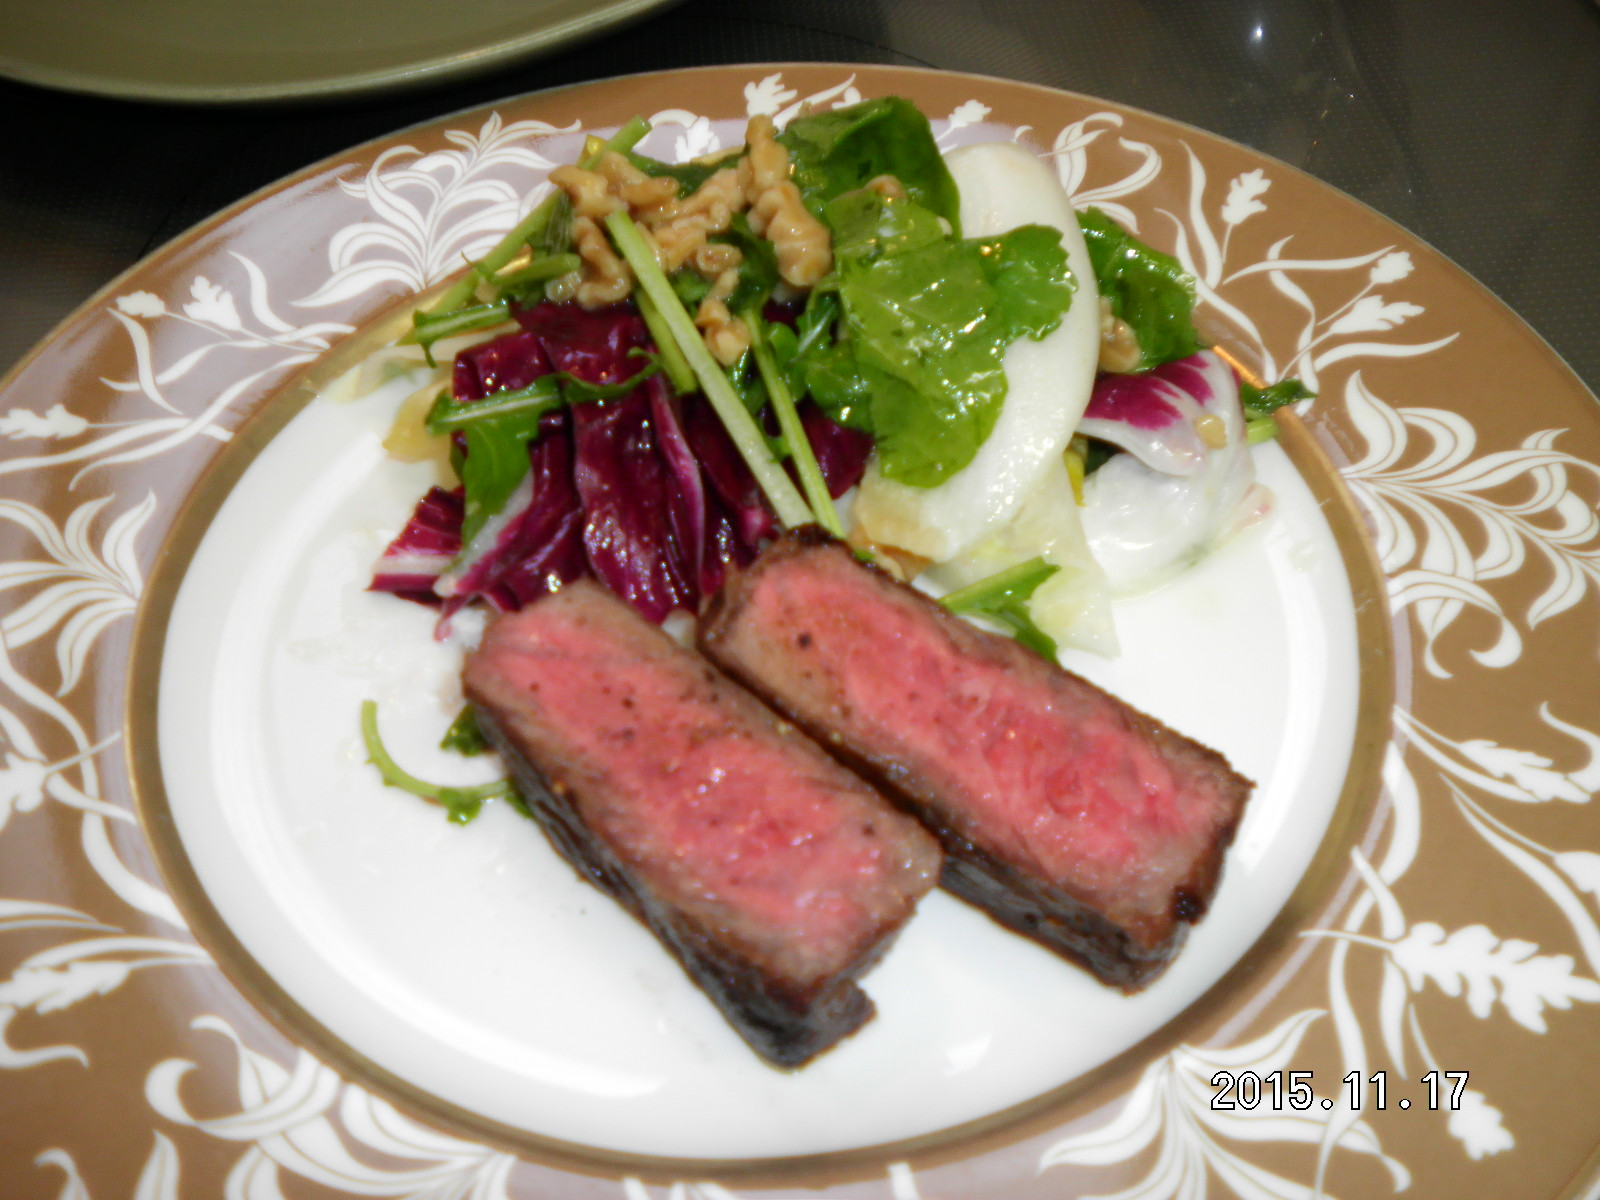 第55回お料理教室_e0190287_1825984.jpg